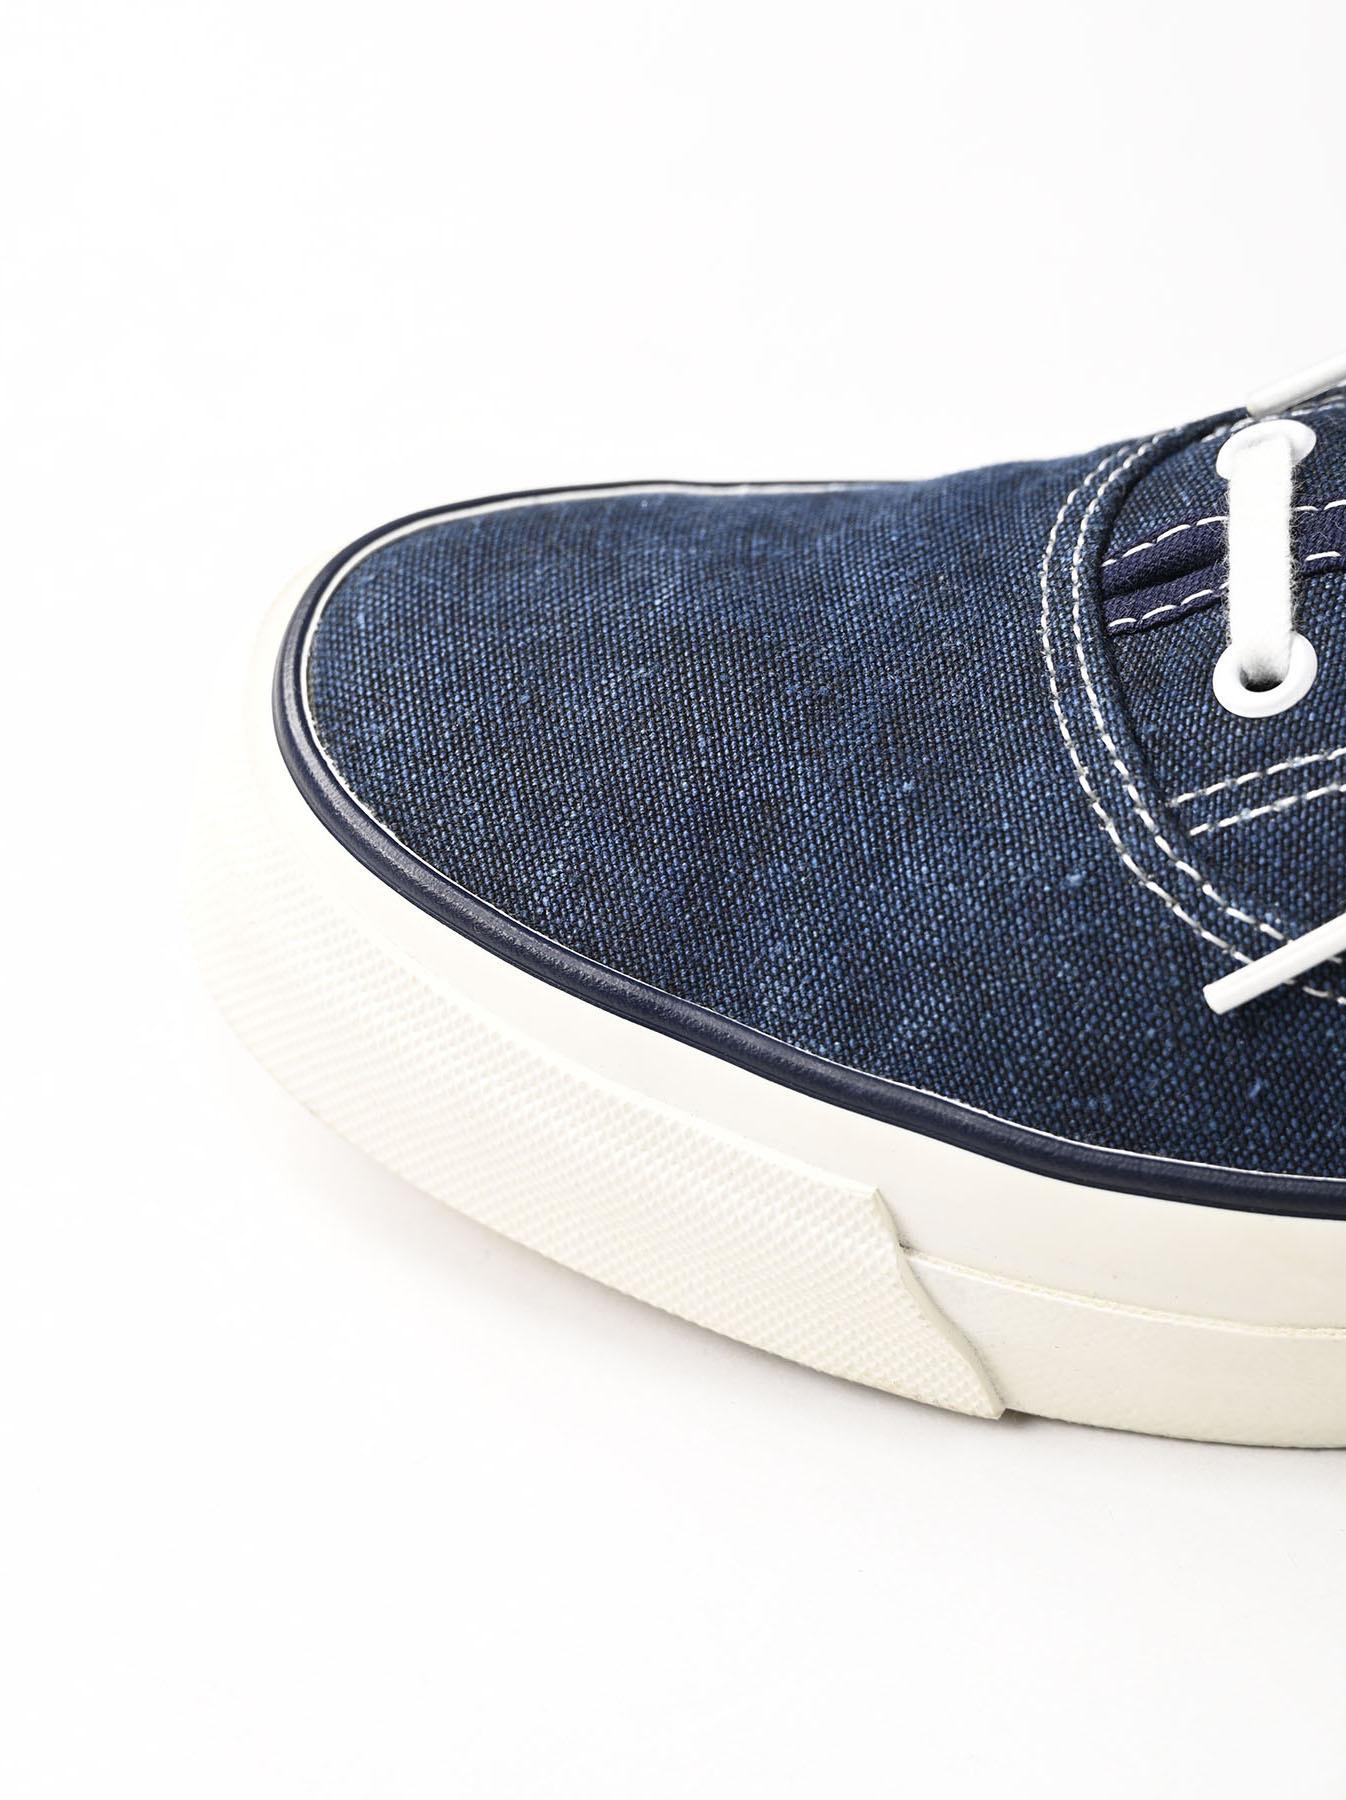 Indigo Linen Duck Sneaker size 5.5-7.5 UK-6